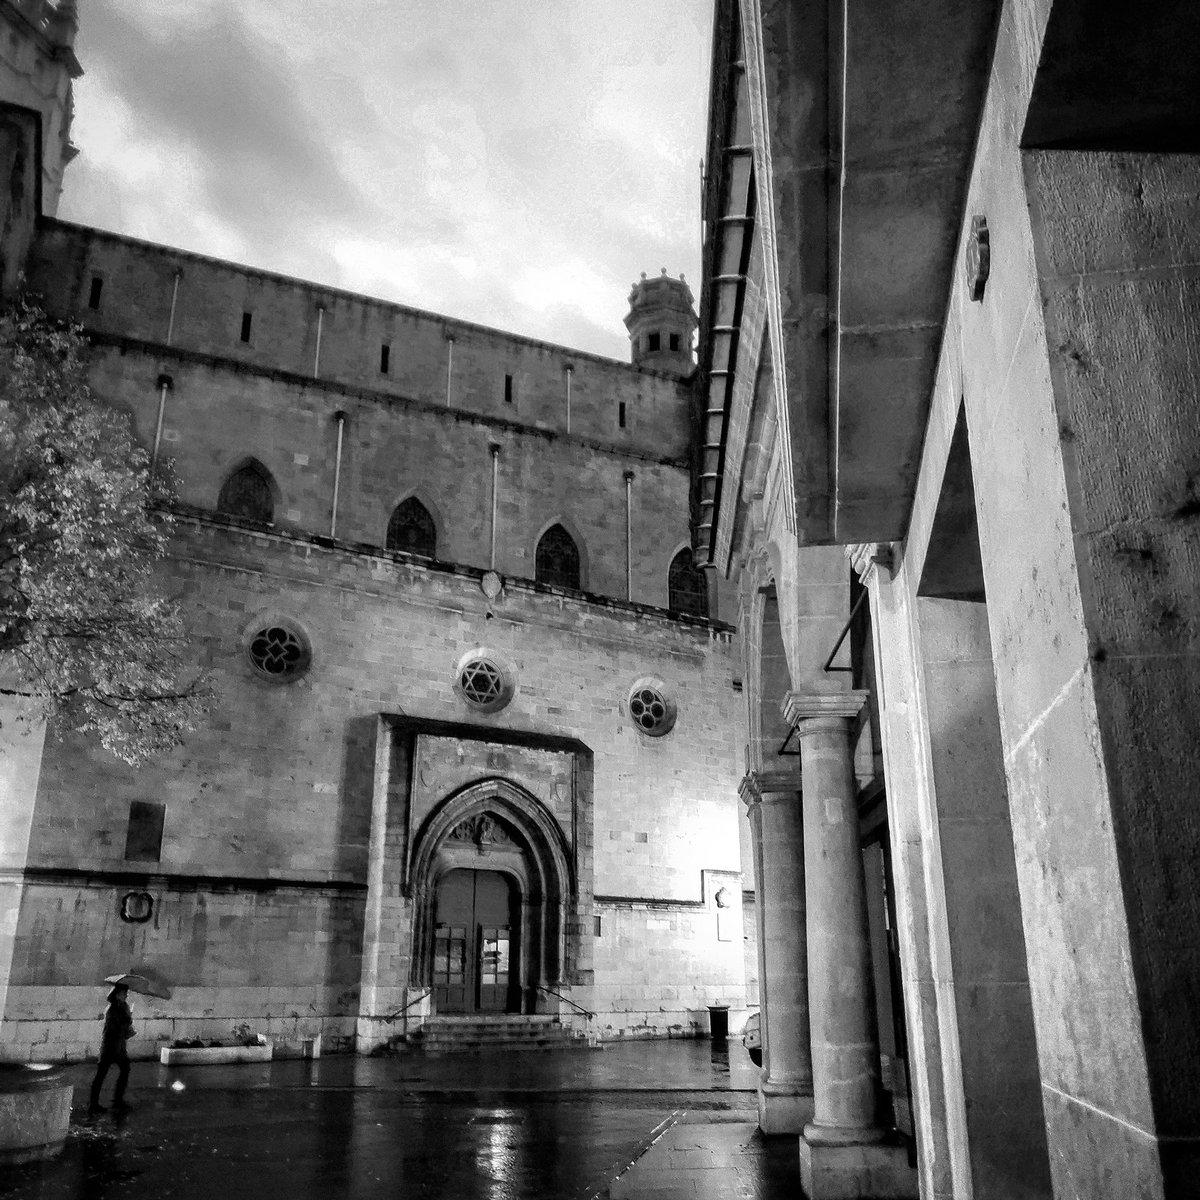 Carrer mullat, calaix shut.Bon dia, bona gent.#Catedral #CasaAbadia#Castelló #Anem